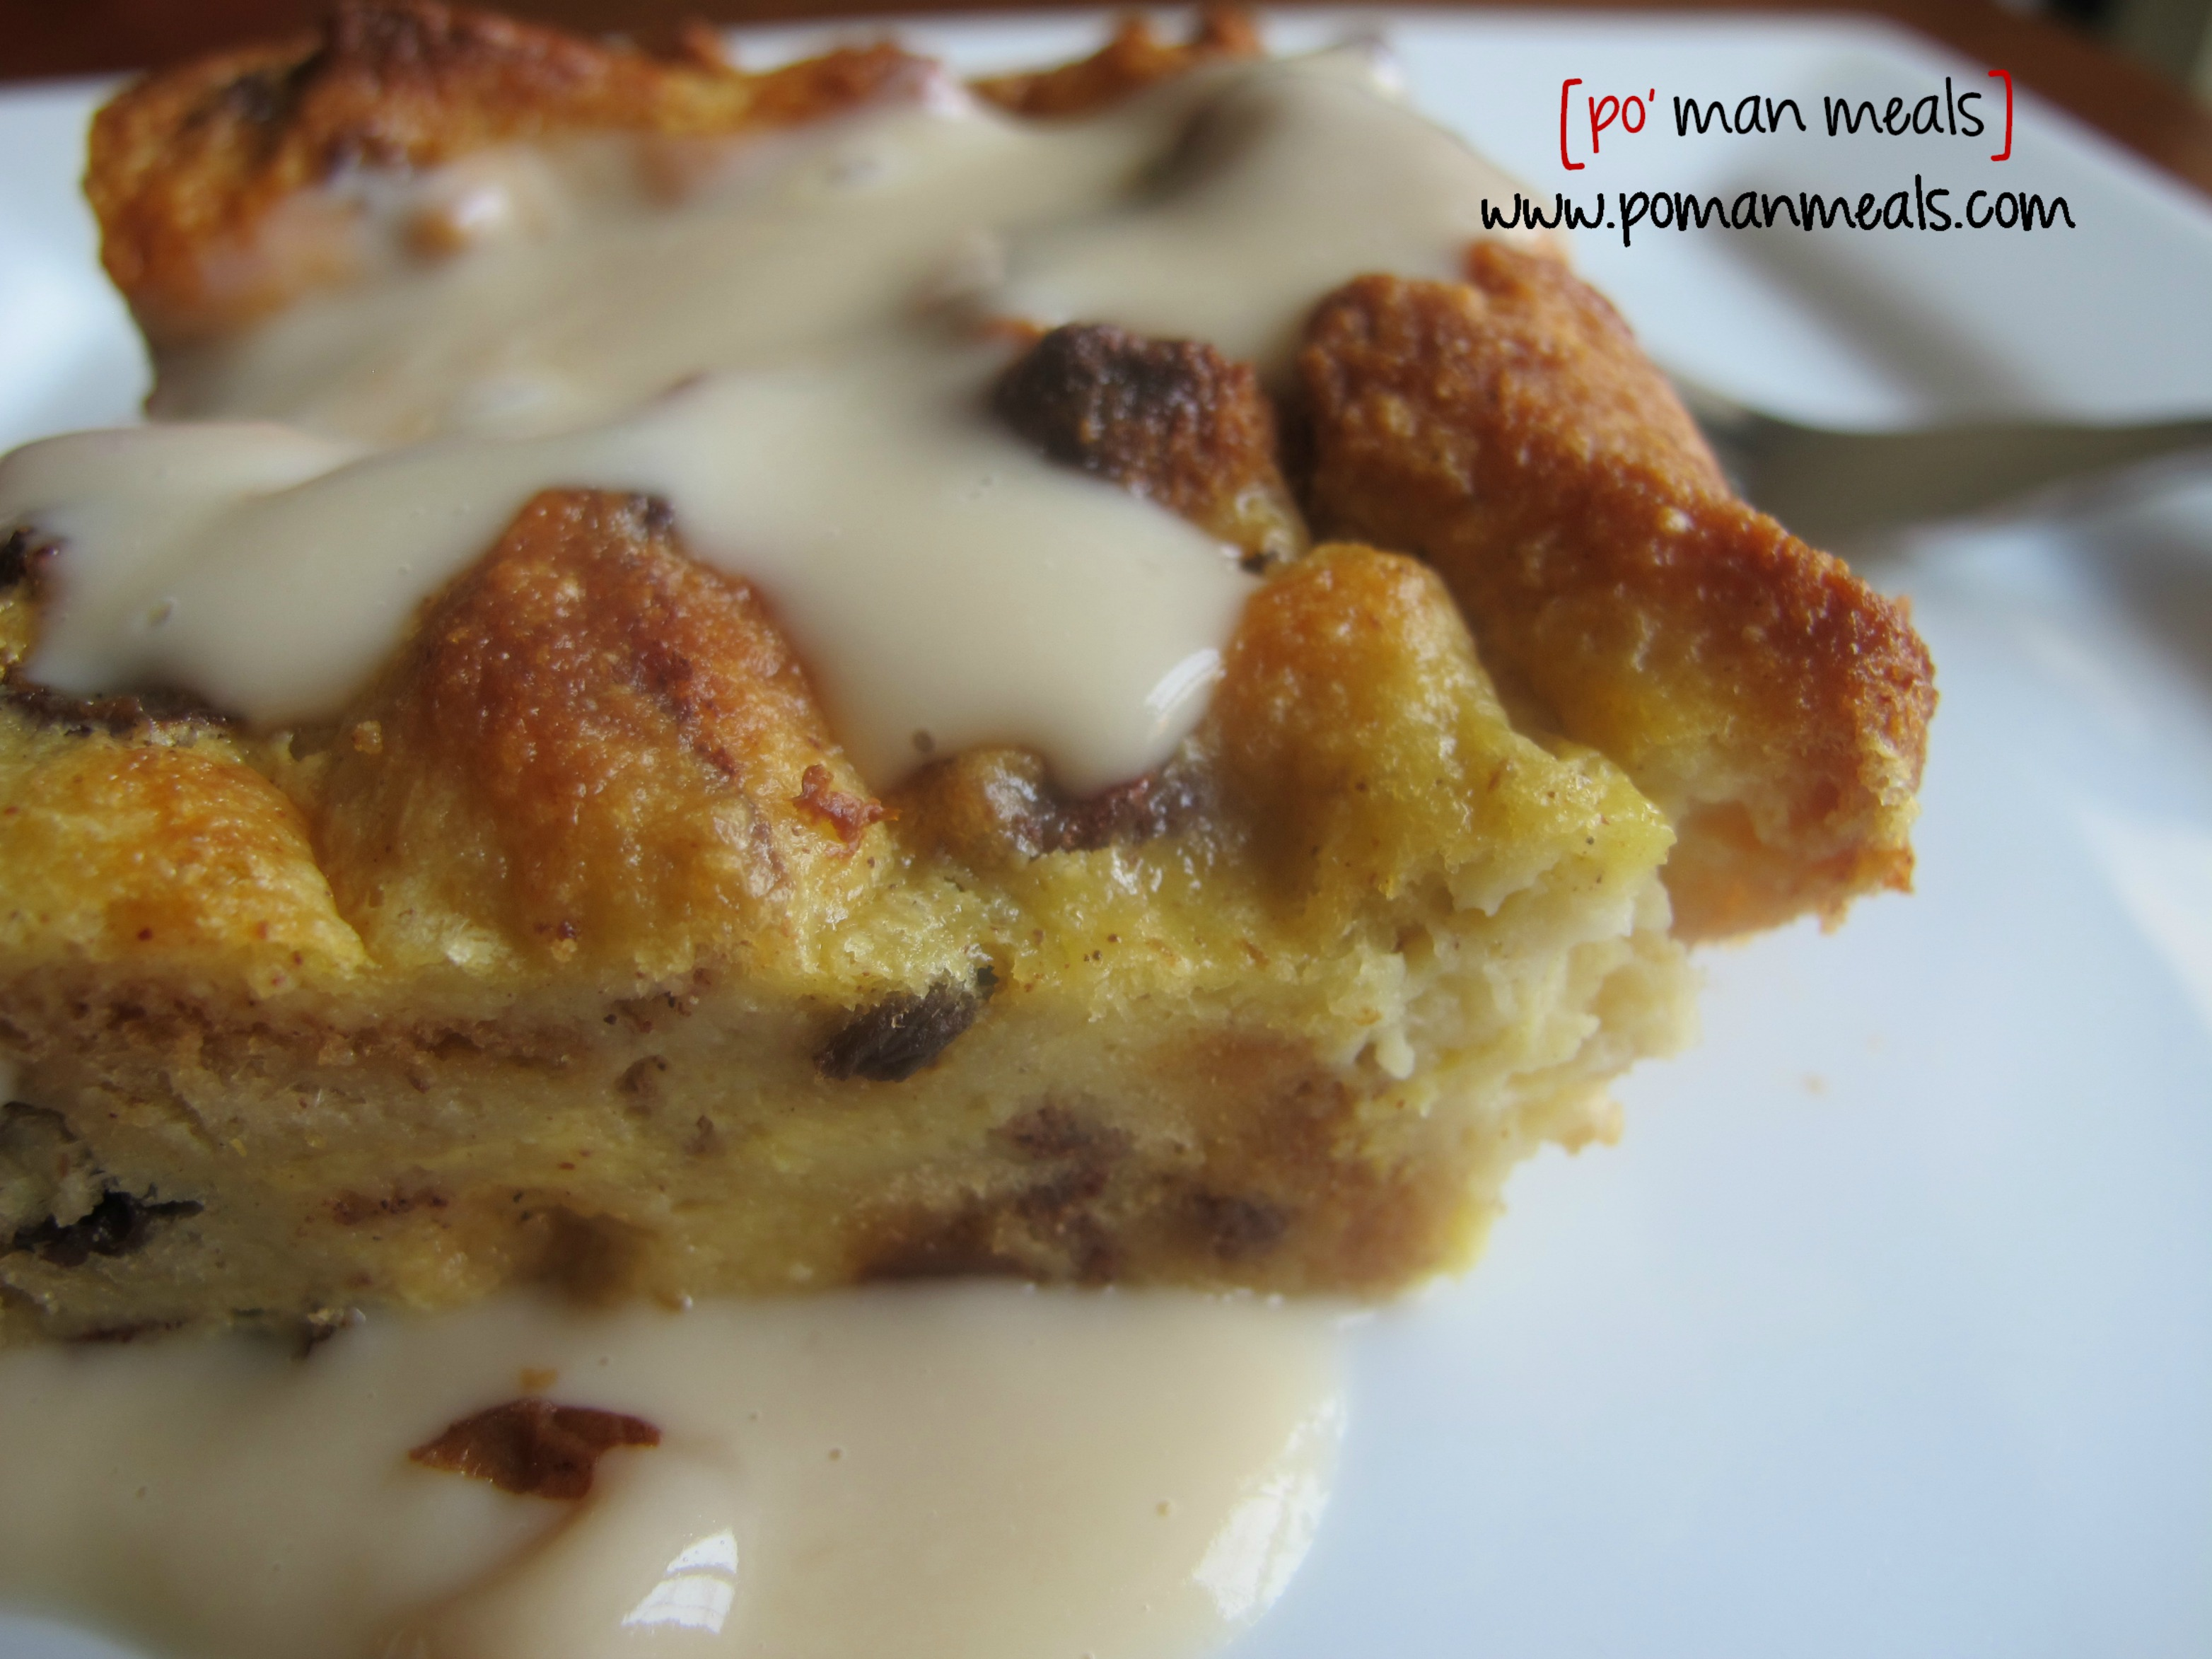 brown bread pudding